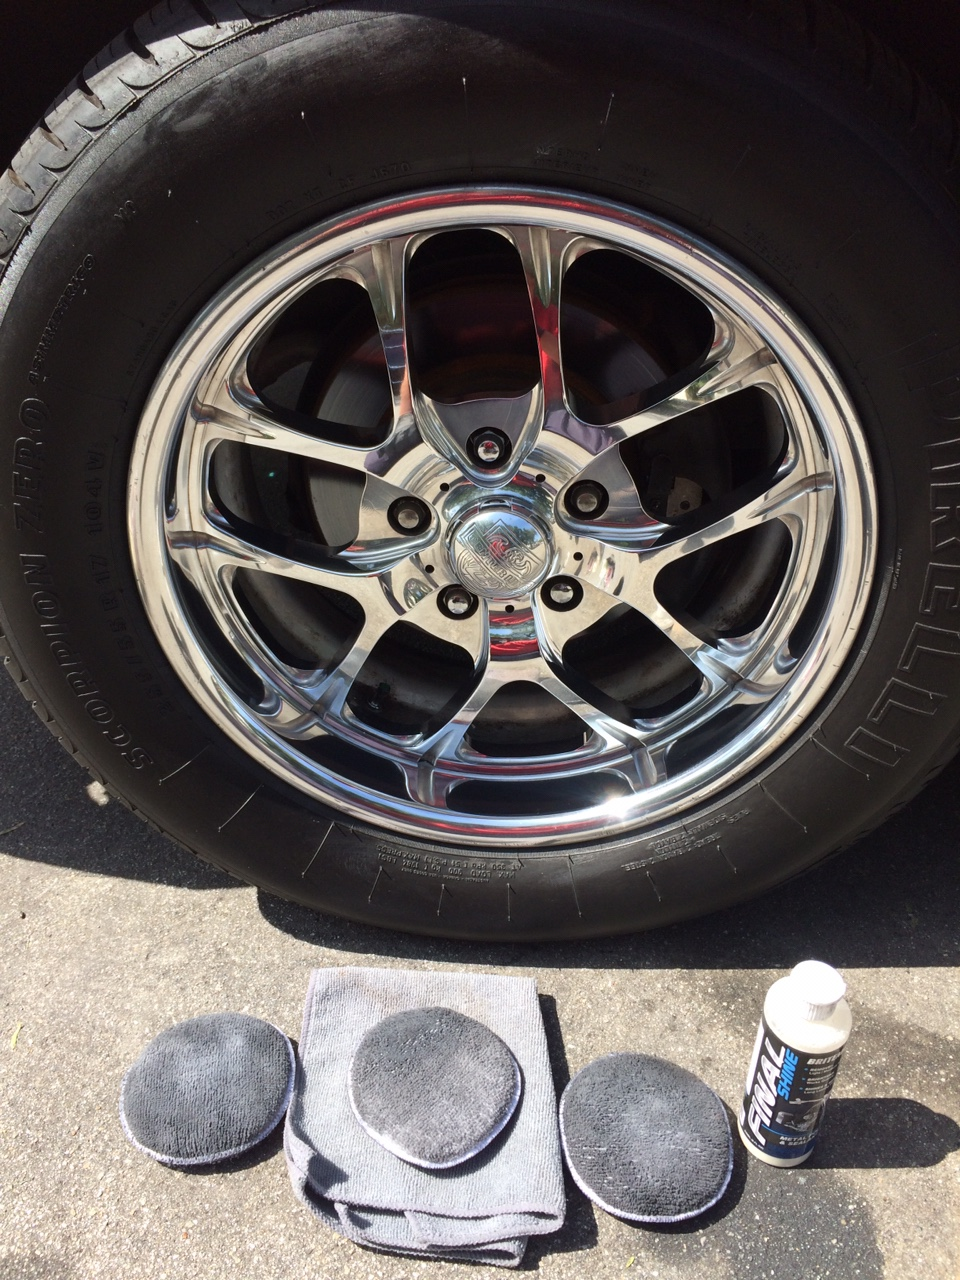 How To Polish Aluminum Wheels >> Polishing Aluminum Wheels